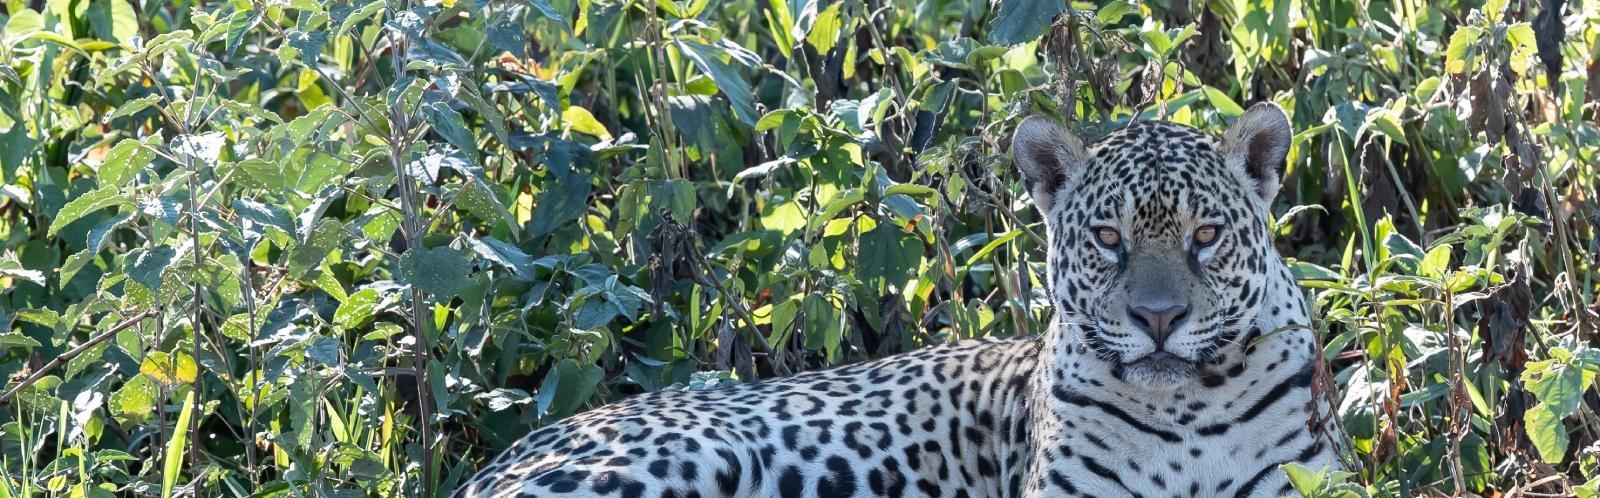 Jaguar in Pantanal, Brazilië - Jos v.d. Berg